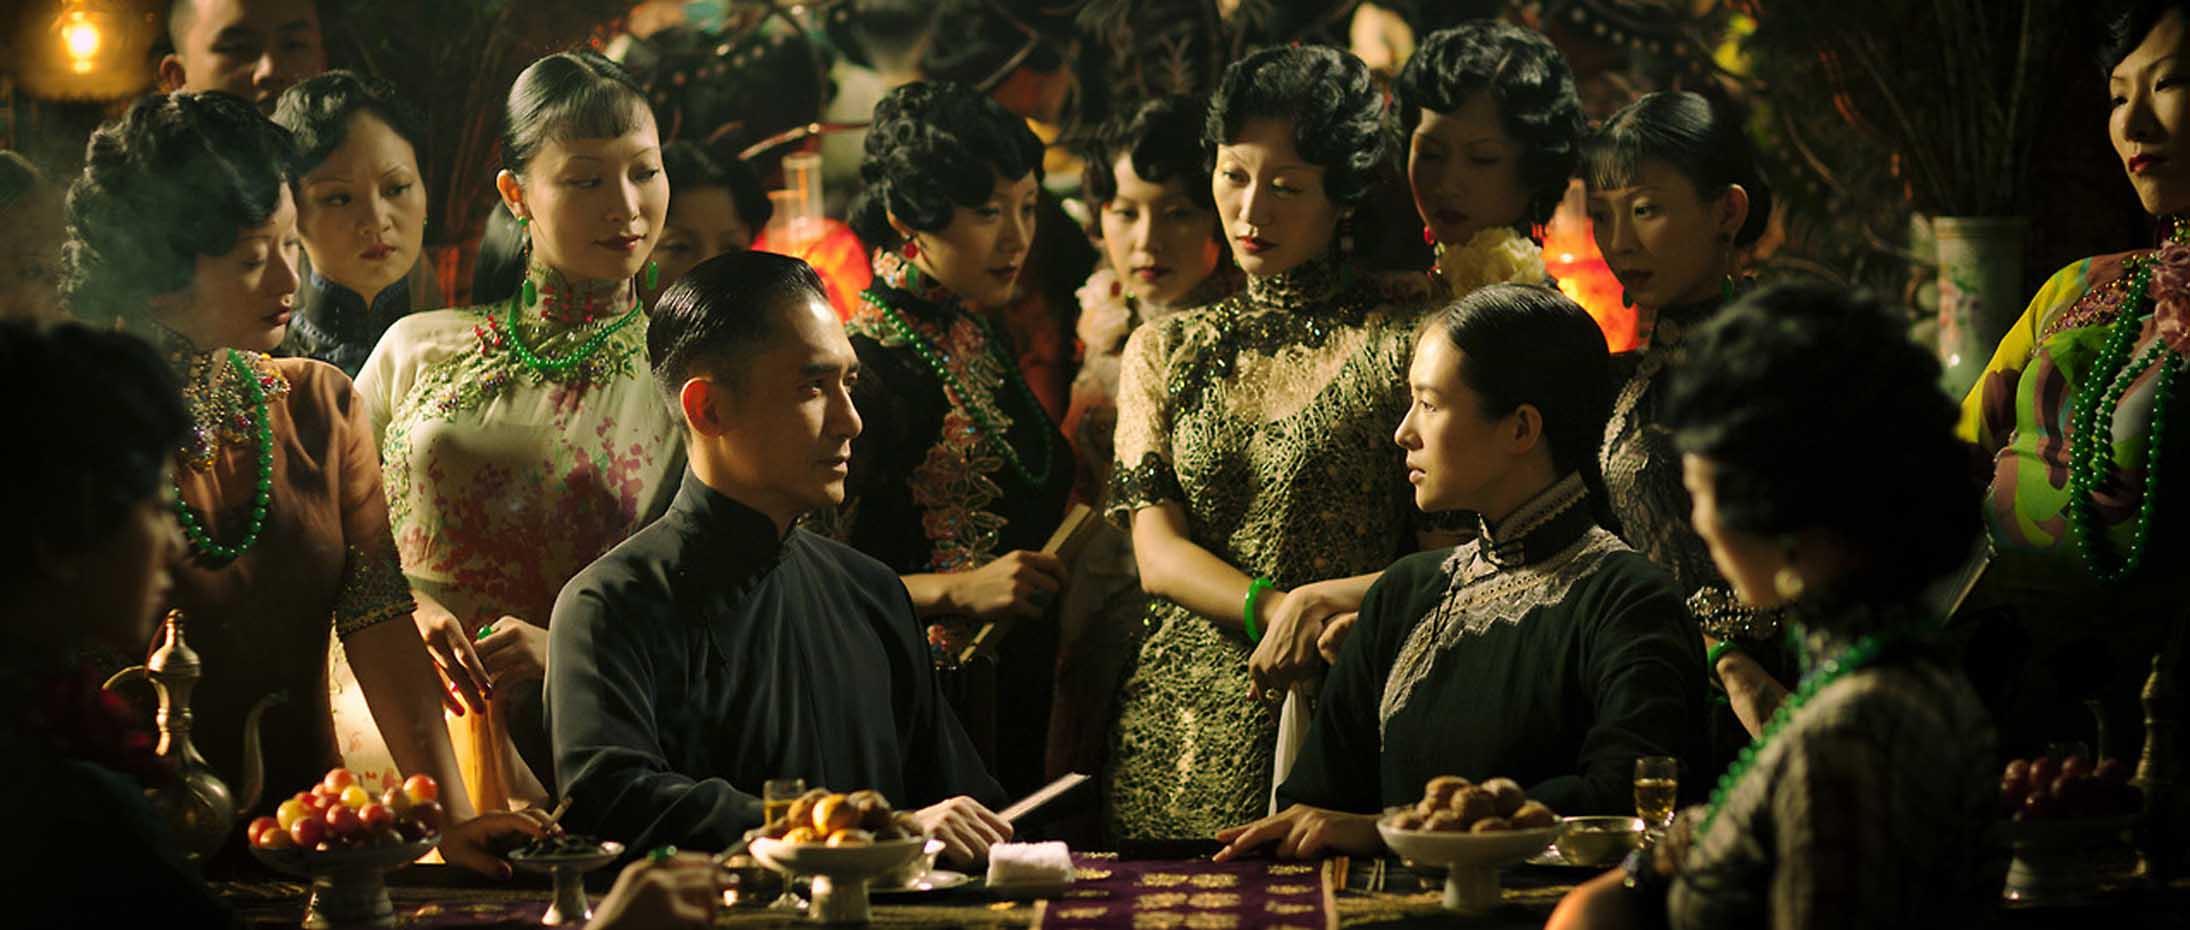 The grandmaster wong kar wai poster pinterest films the grandmaster wong kar wai poster pinterest films movie and cinema voltagebd Choice Image